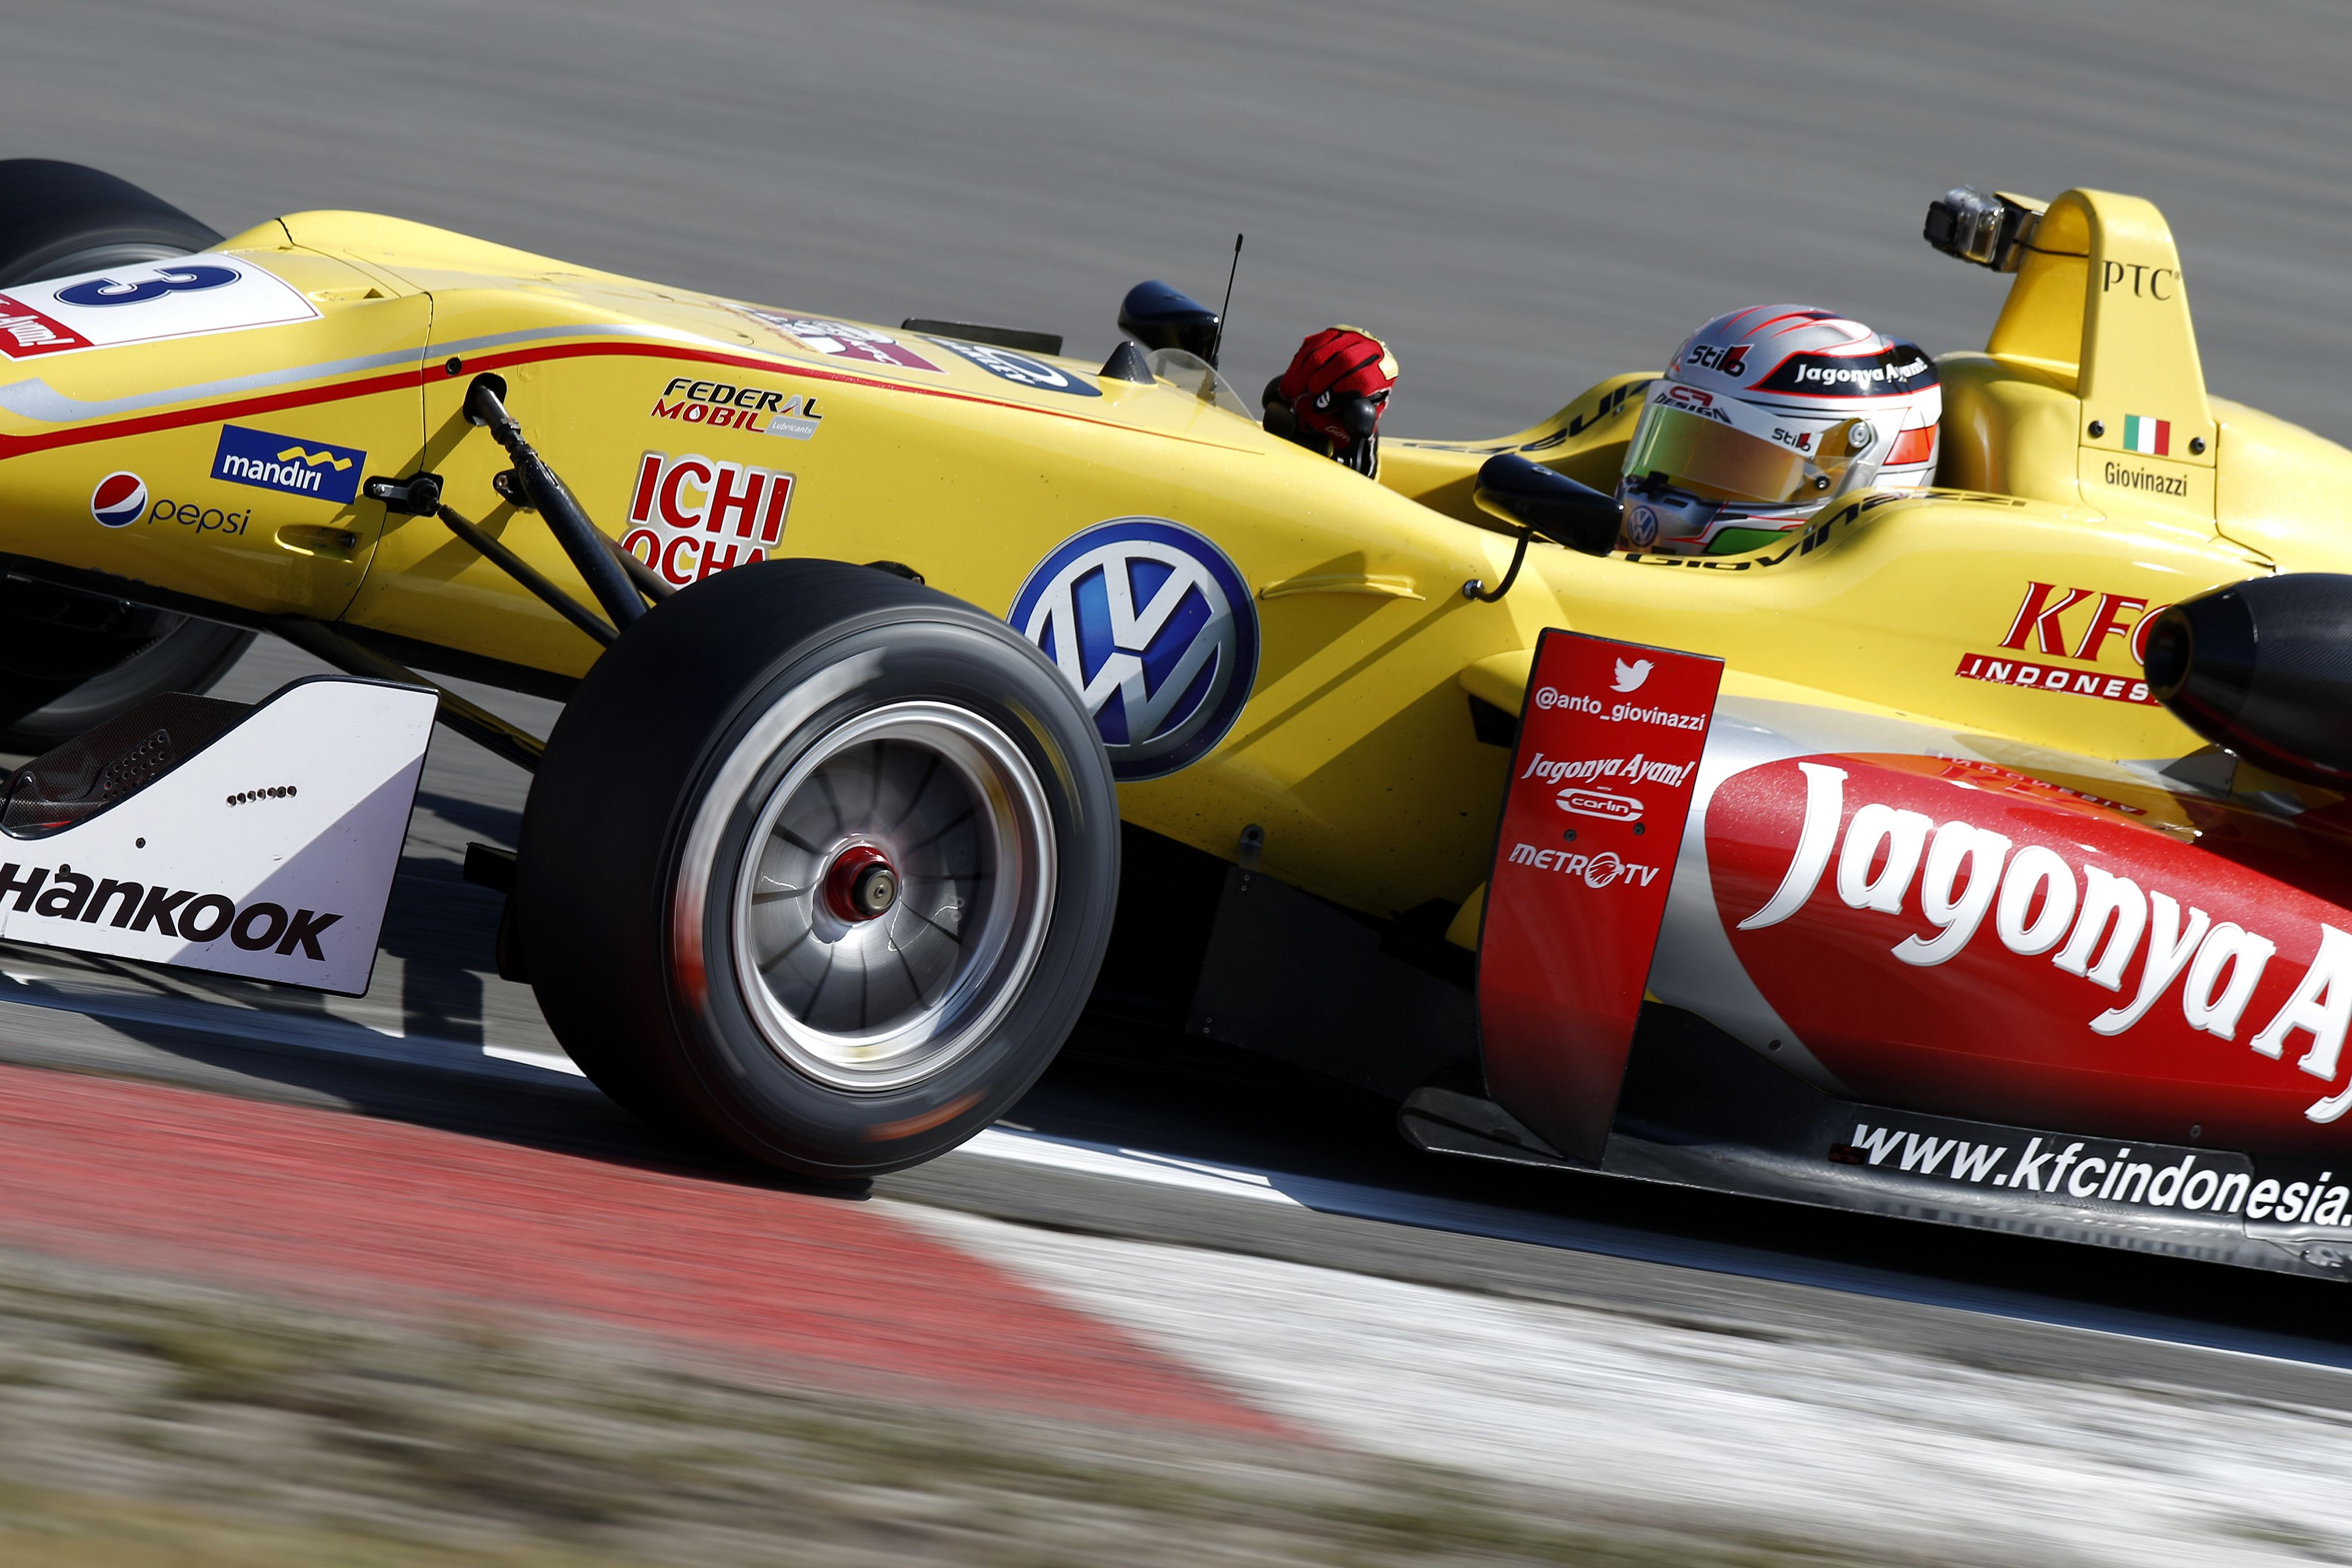 3 Antonio Giovinazzi (ITA, Jagonya Ayam with Carlin, Dallara F312 - Volkswagen), FIA Formula 3 European Championship, round 7, Zandvoort (NED) - 10. - 12. July 2015